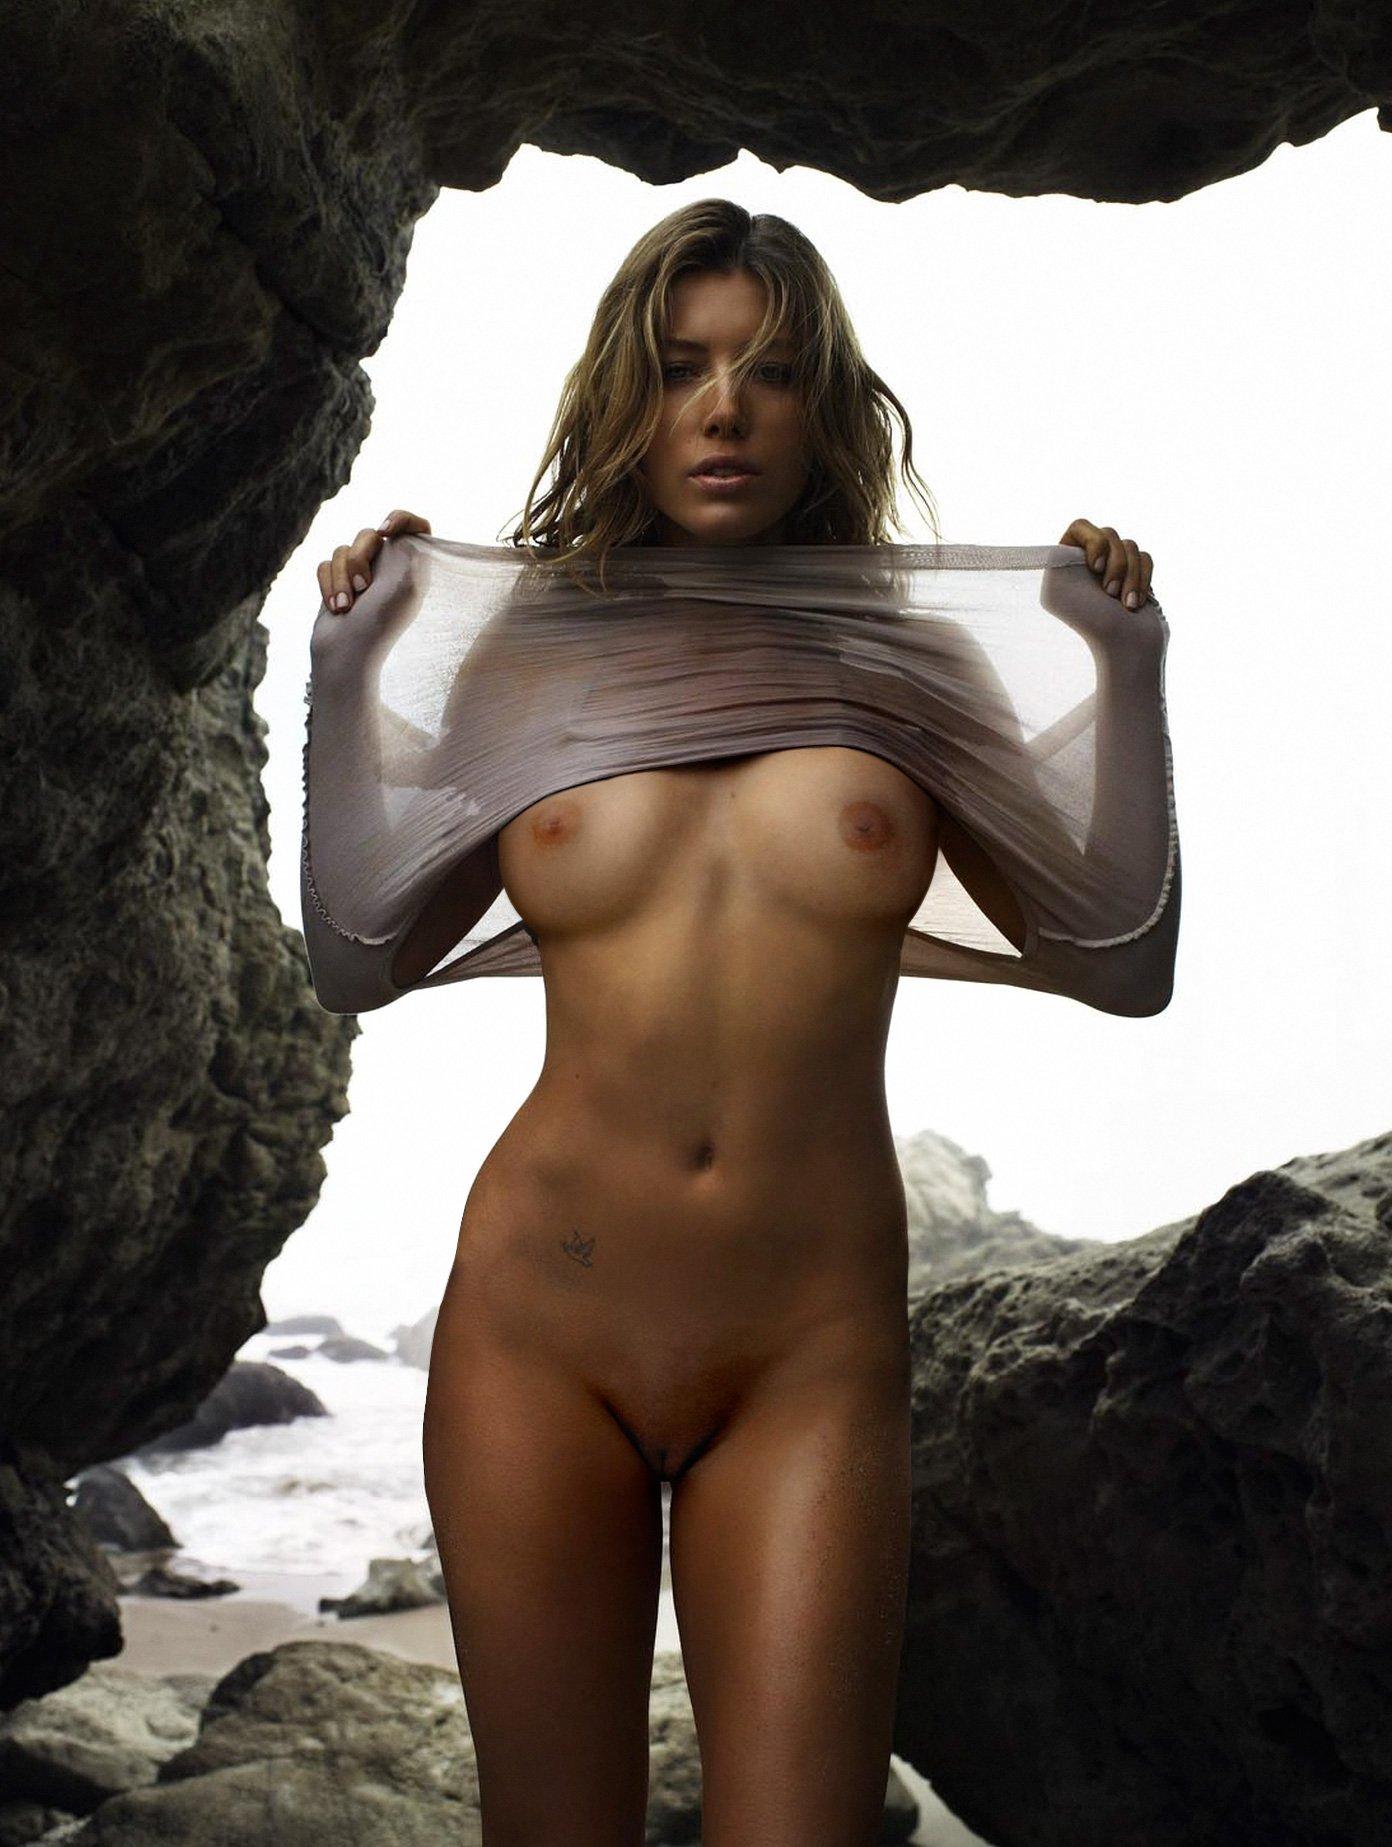 Jessica Biel Shows her Nude Beautiful Body